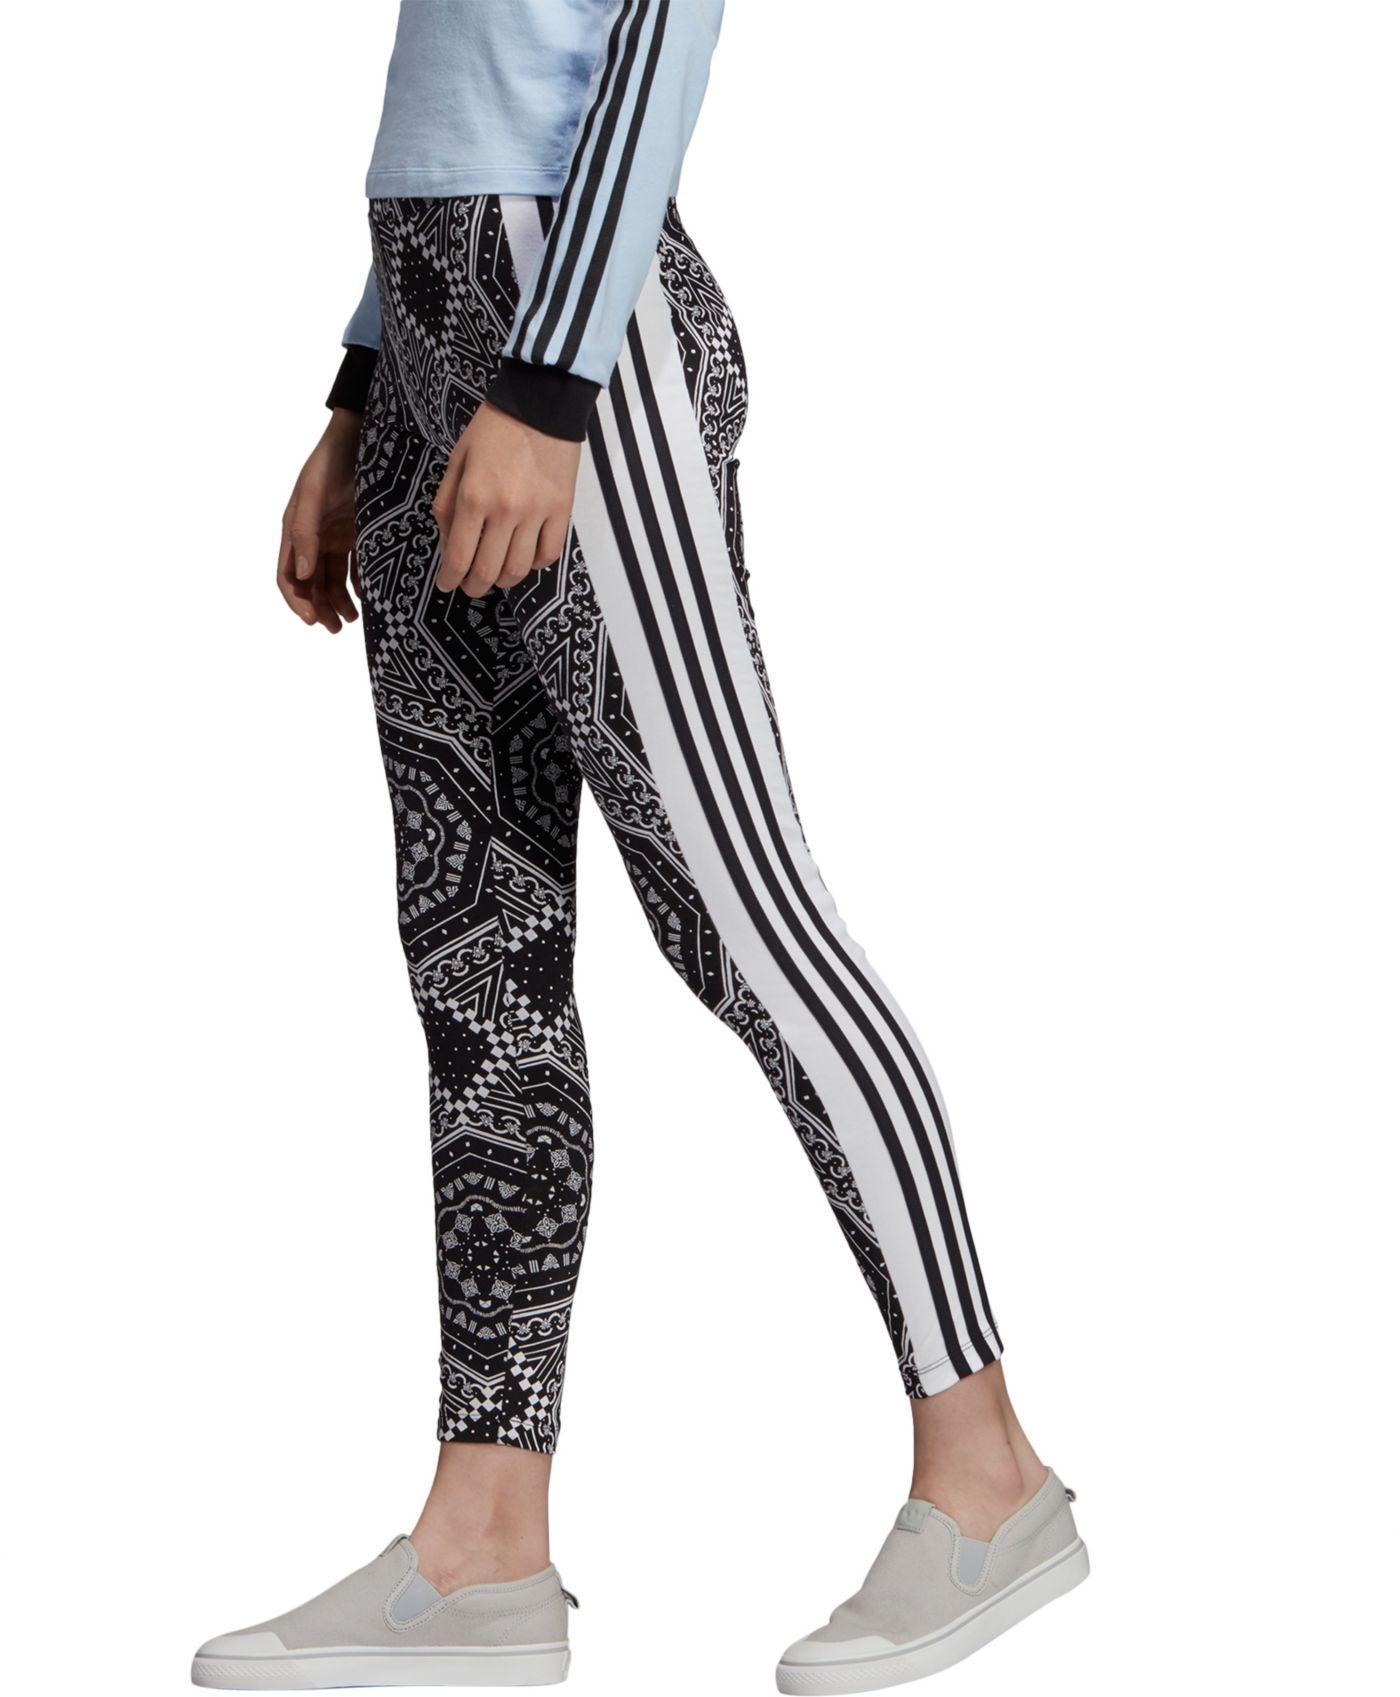 adidas Originals Women's Printed Tights